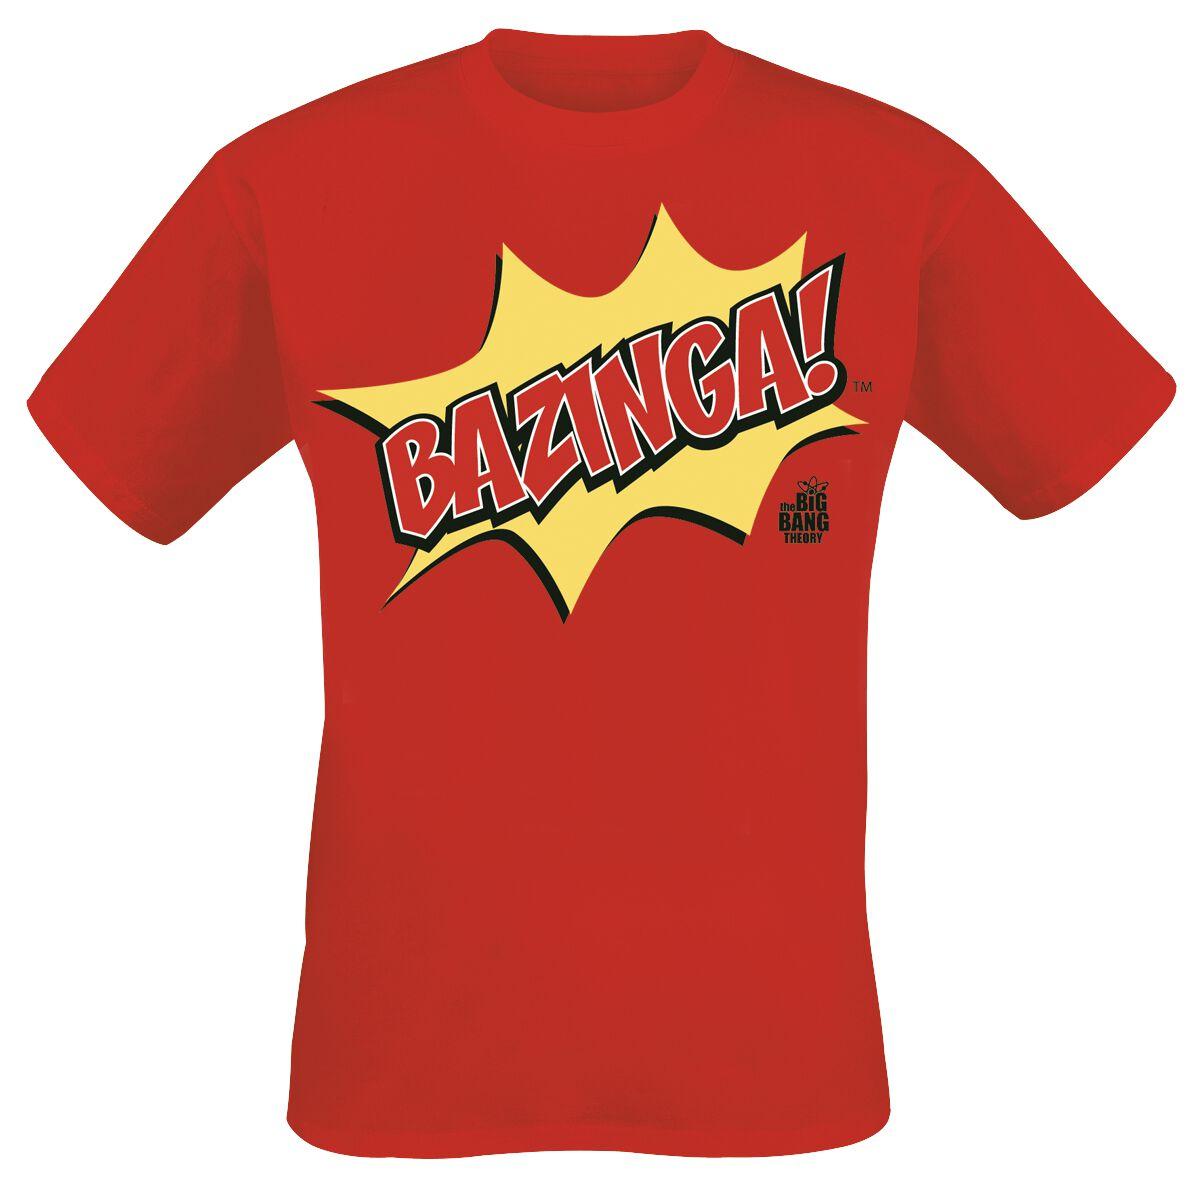 The Big Bang Theory Bazinga! T-Shirt rot M401332 - FOTL 61-036-0 - P0015